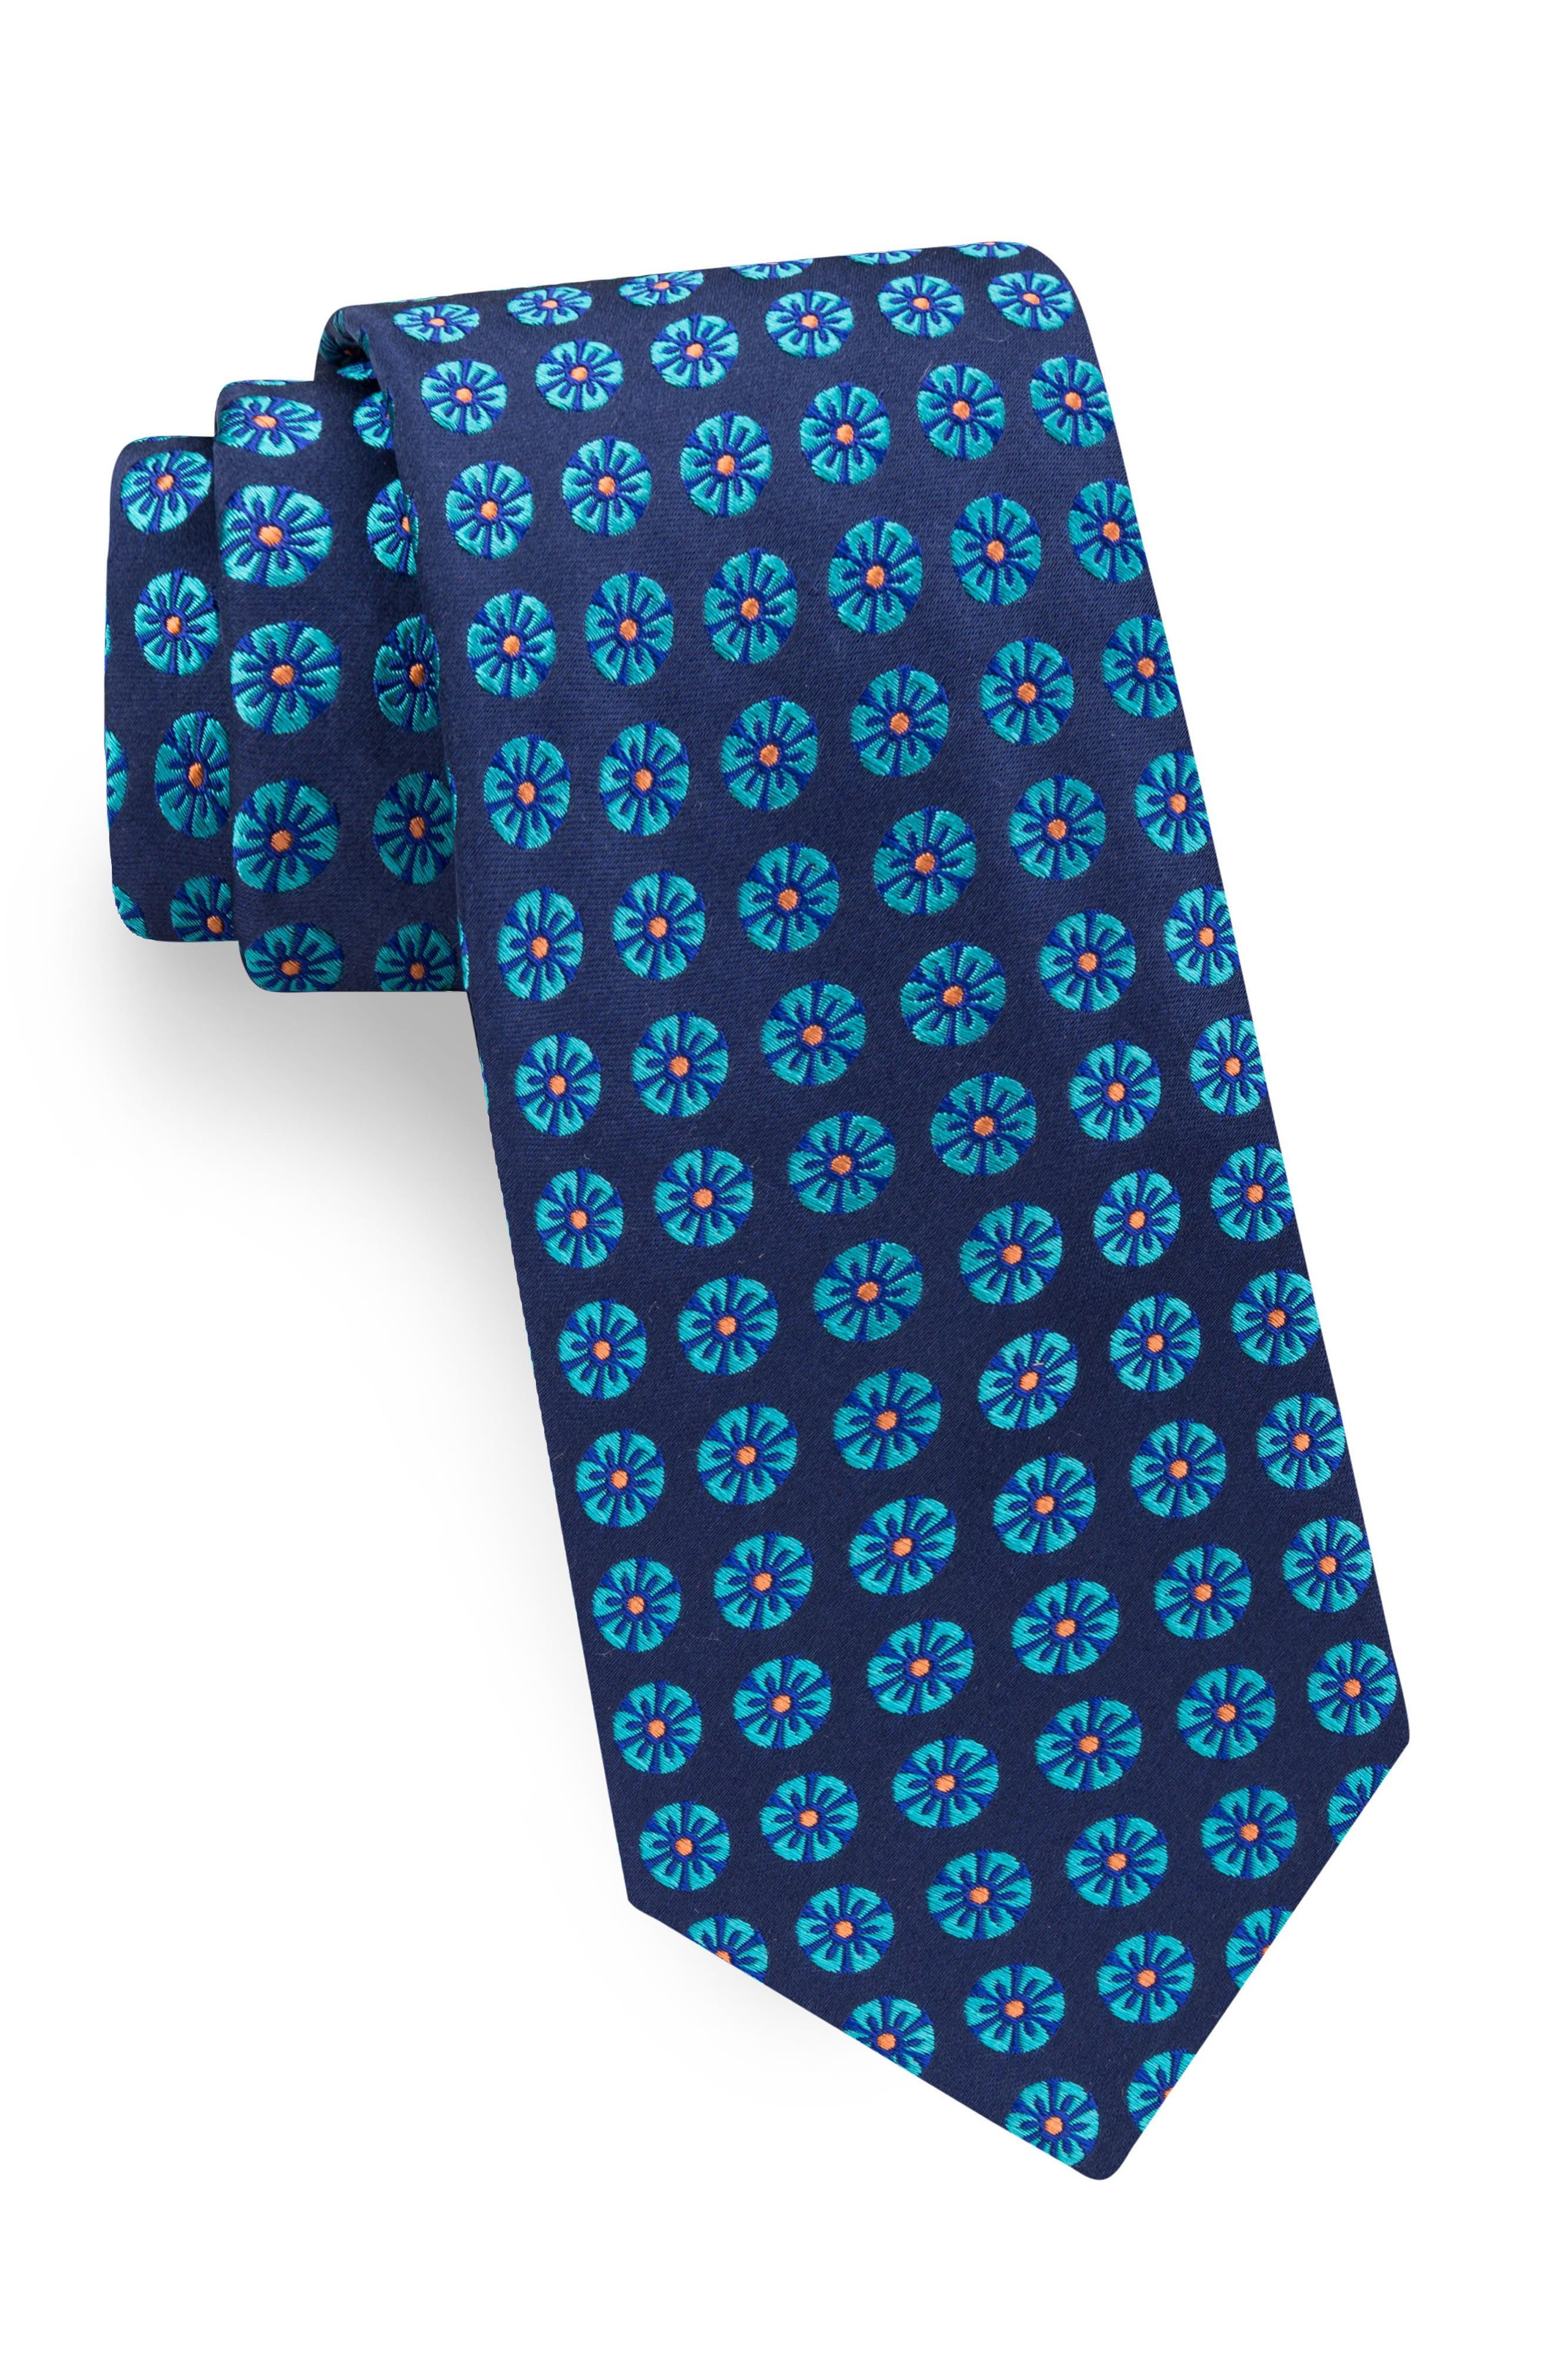 TED BAKER LONDON Fiorellino Silk Tie